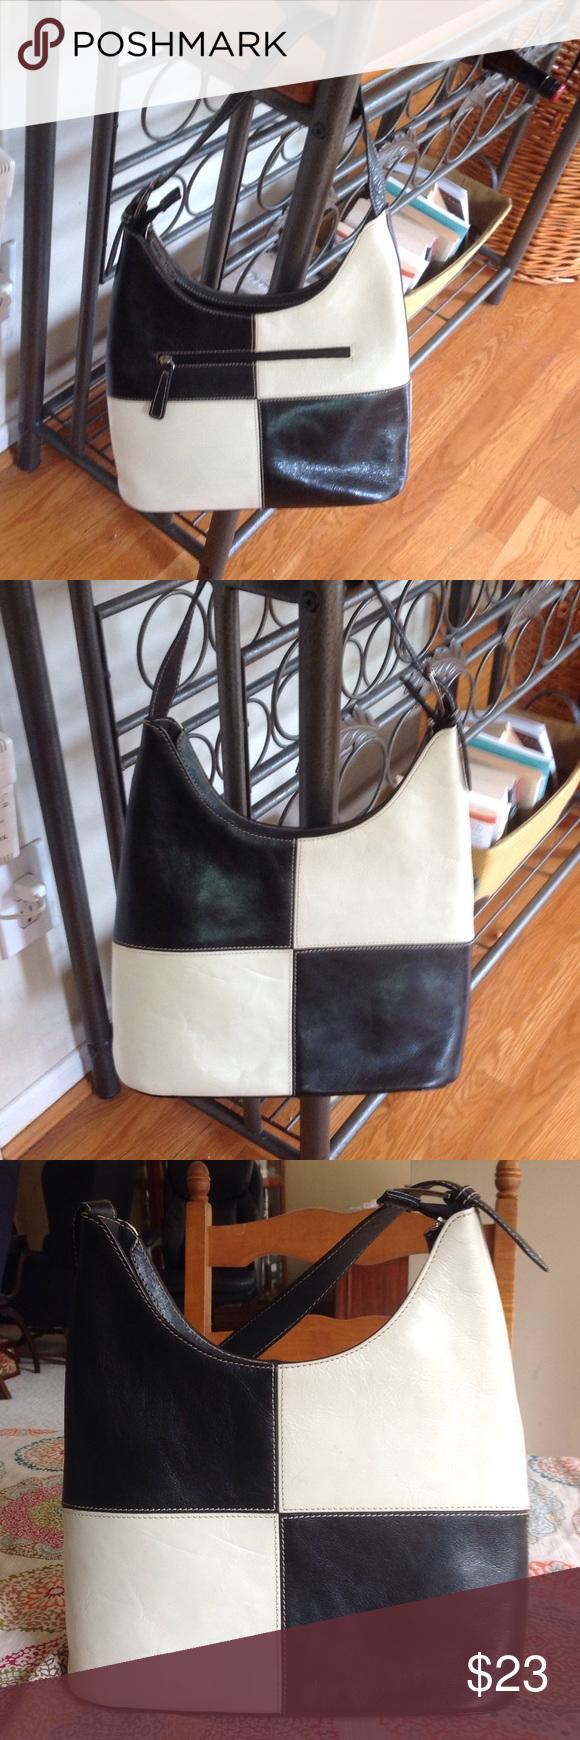 Wilsons leather pelle studio bag Wilsons leather